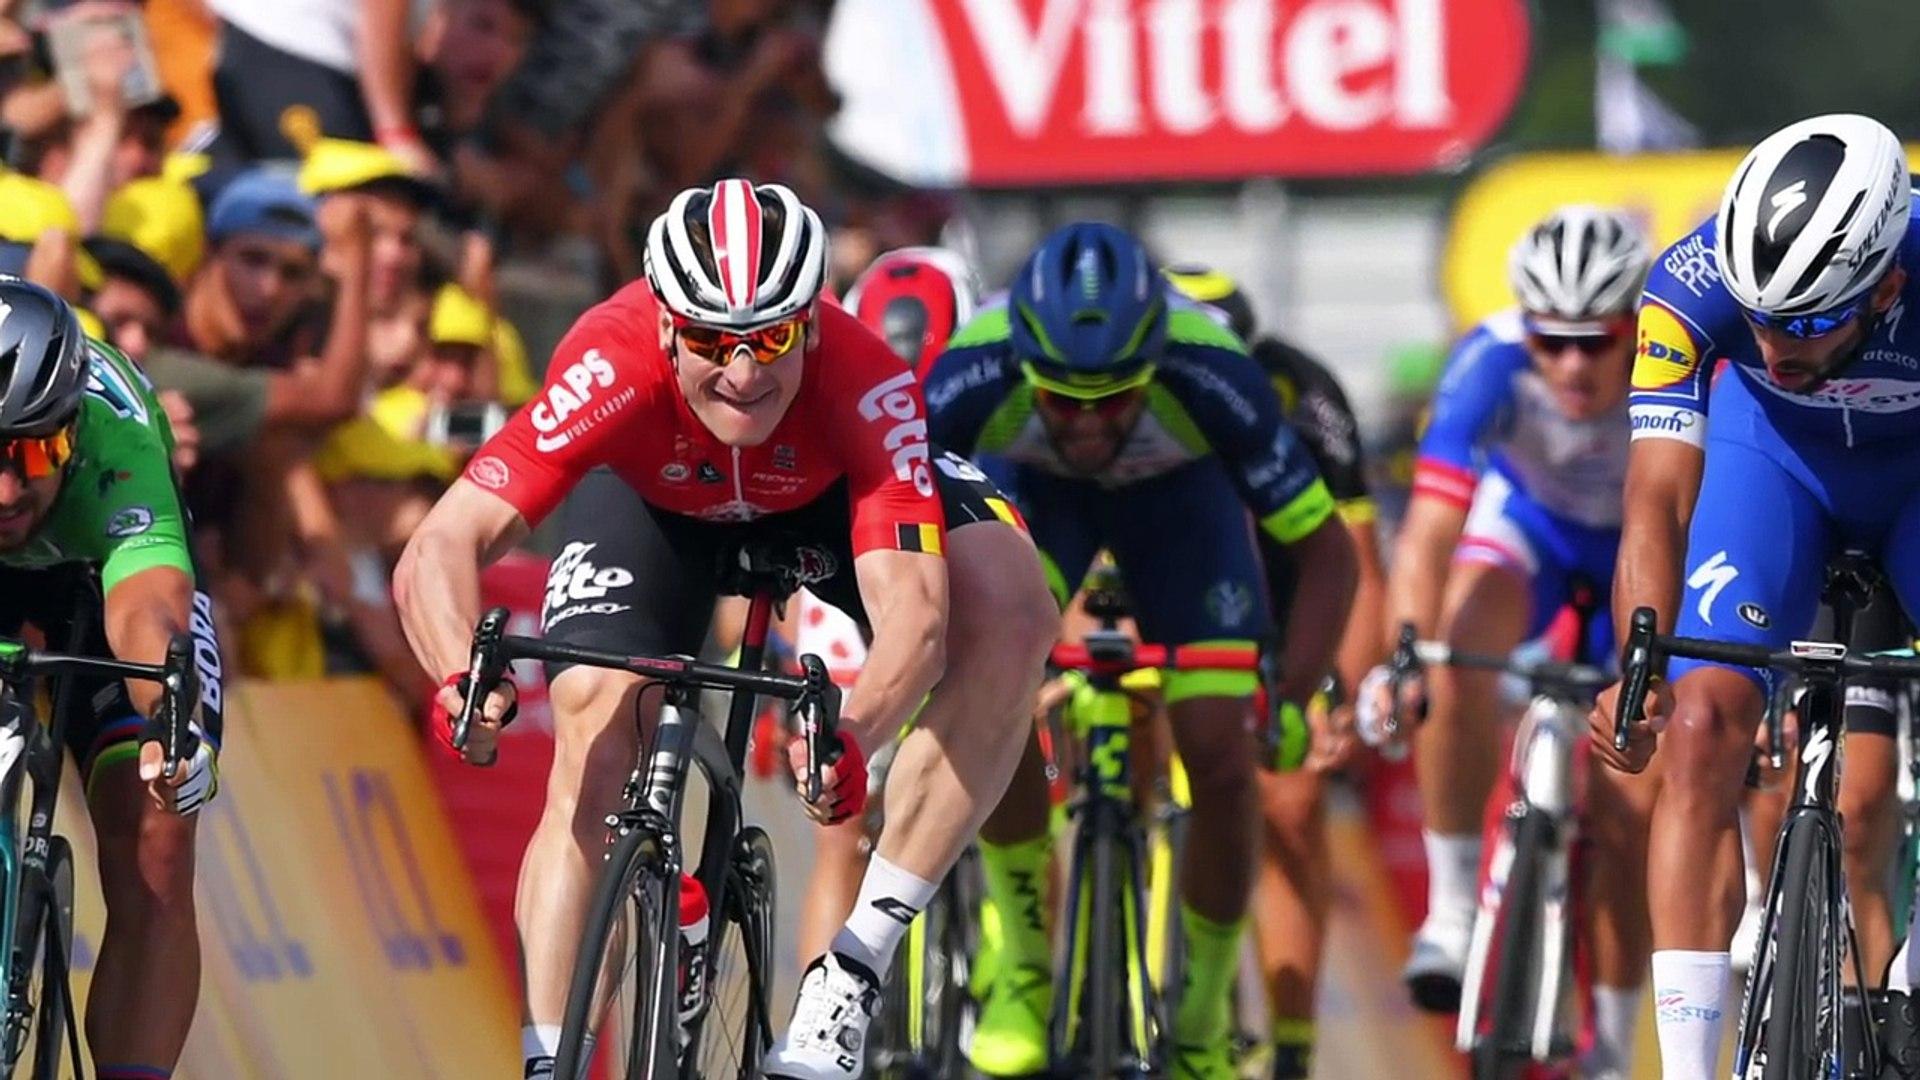 Tour de France, Tour of Austria & Giro Rosa | The Cycling Race News Show